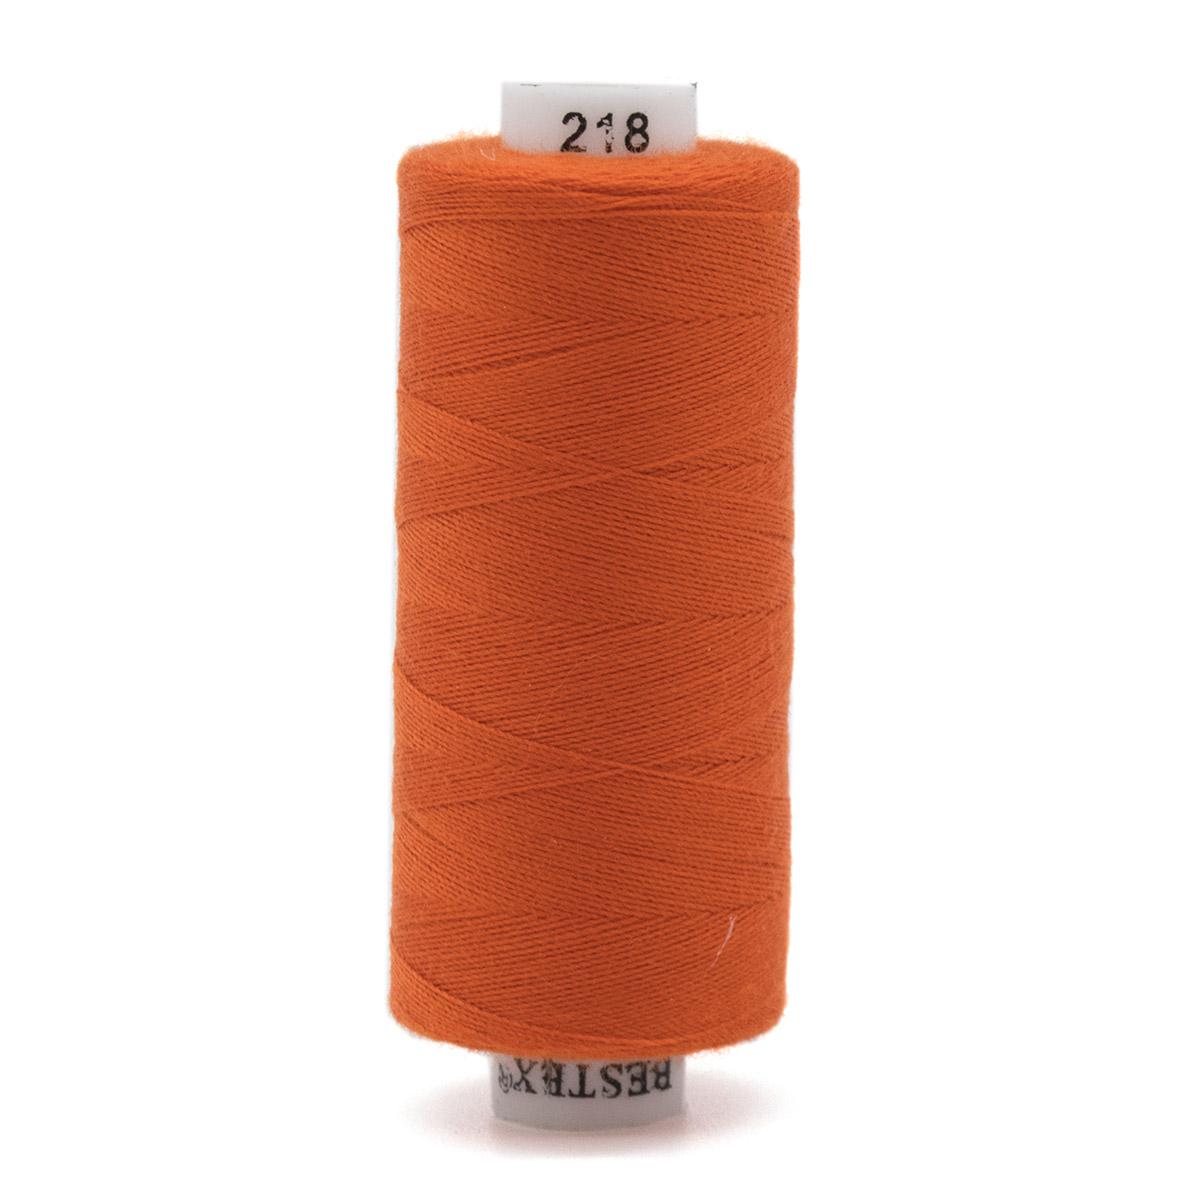 Нитки, 40/2, 400 ярд., 100% полиэстер, Bestex (218 т.оранжевый) фото